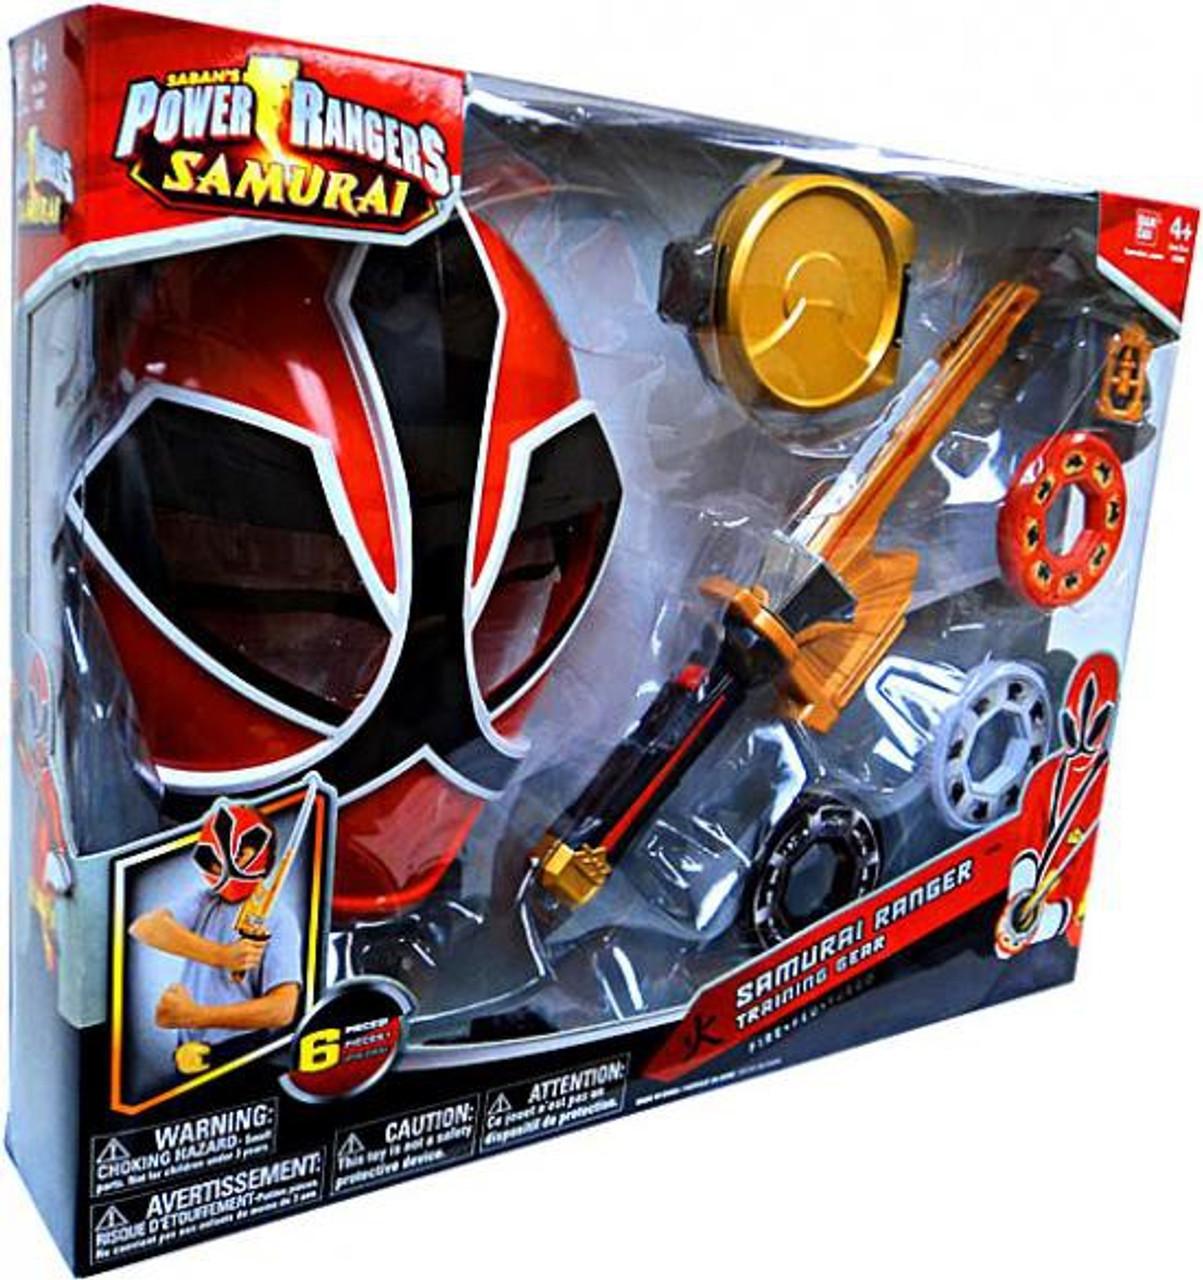 Power Rangers Samurai Ranger Training Gear Roleplay Toy